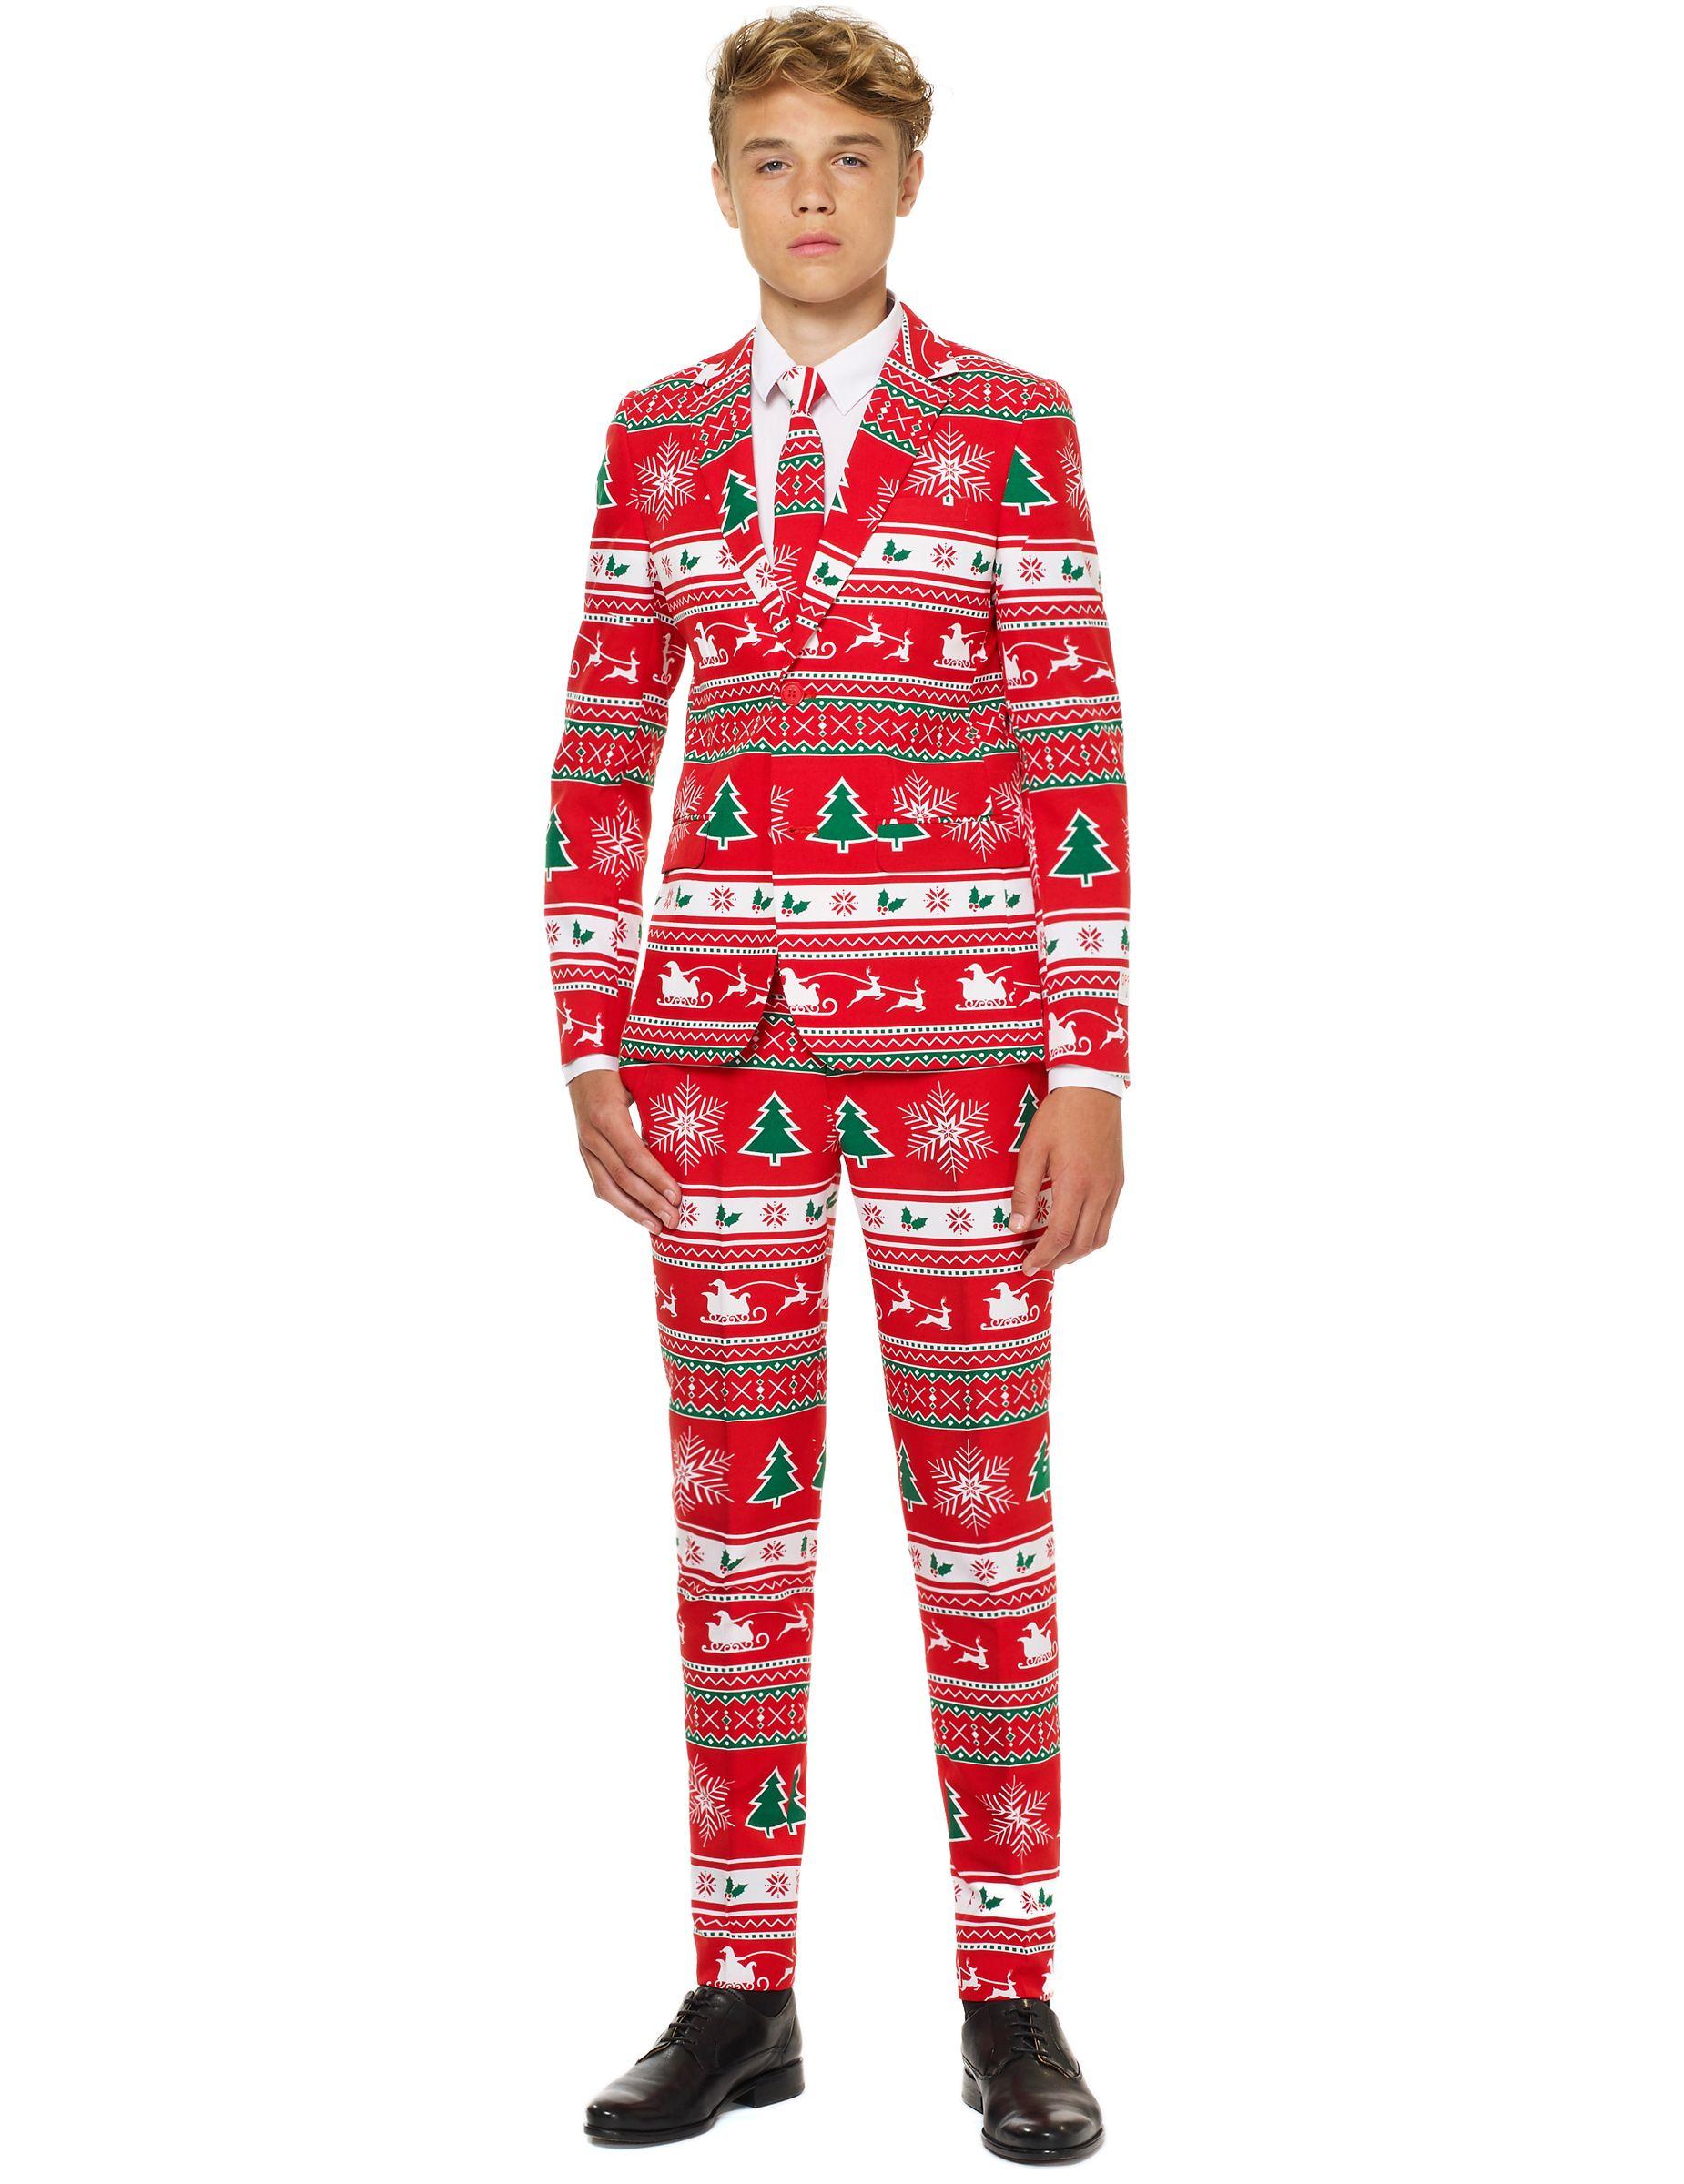 Traje Mr. Winterwonderland adolescente navidad de Opposuits™  Este disfraz  de Mr. Winterwonderland e8c09d52748